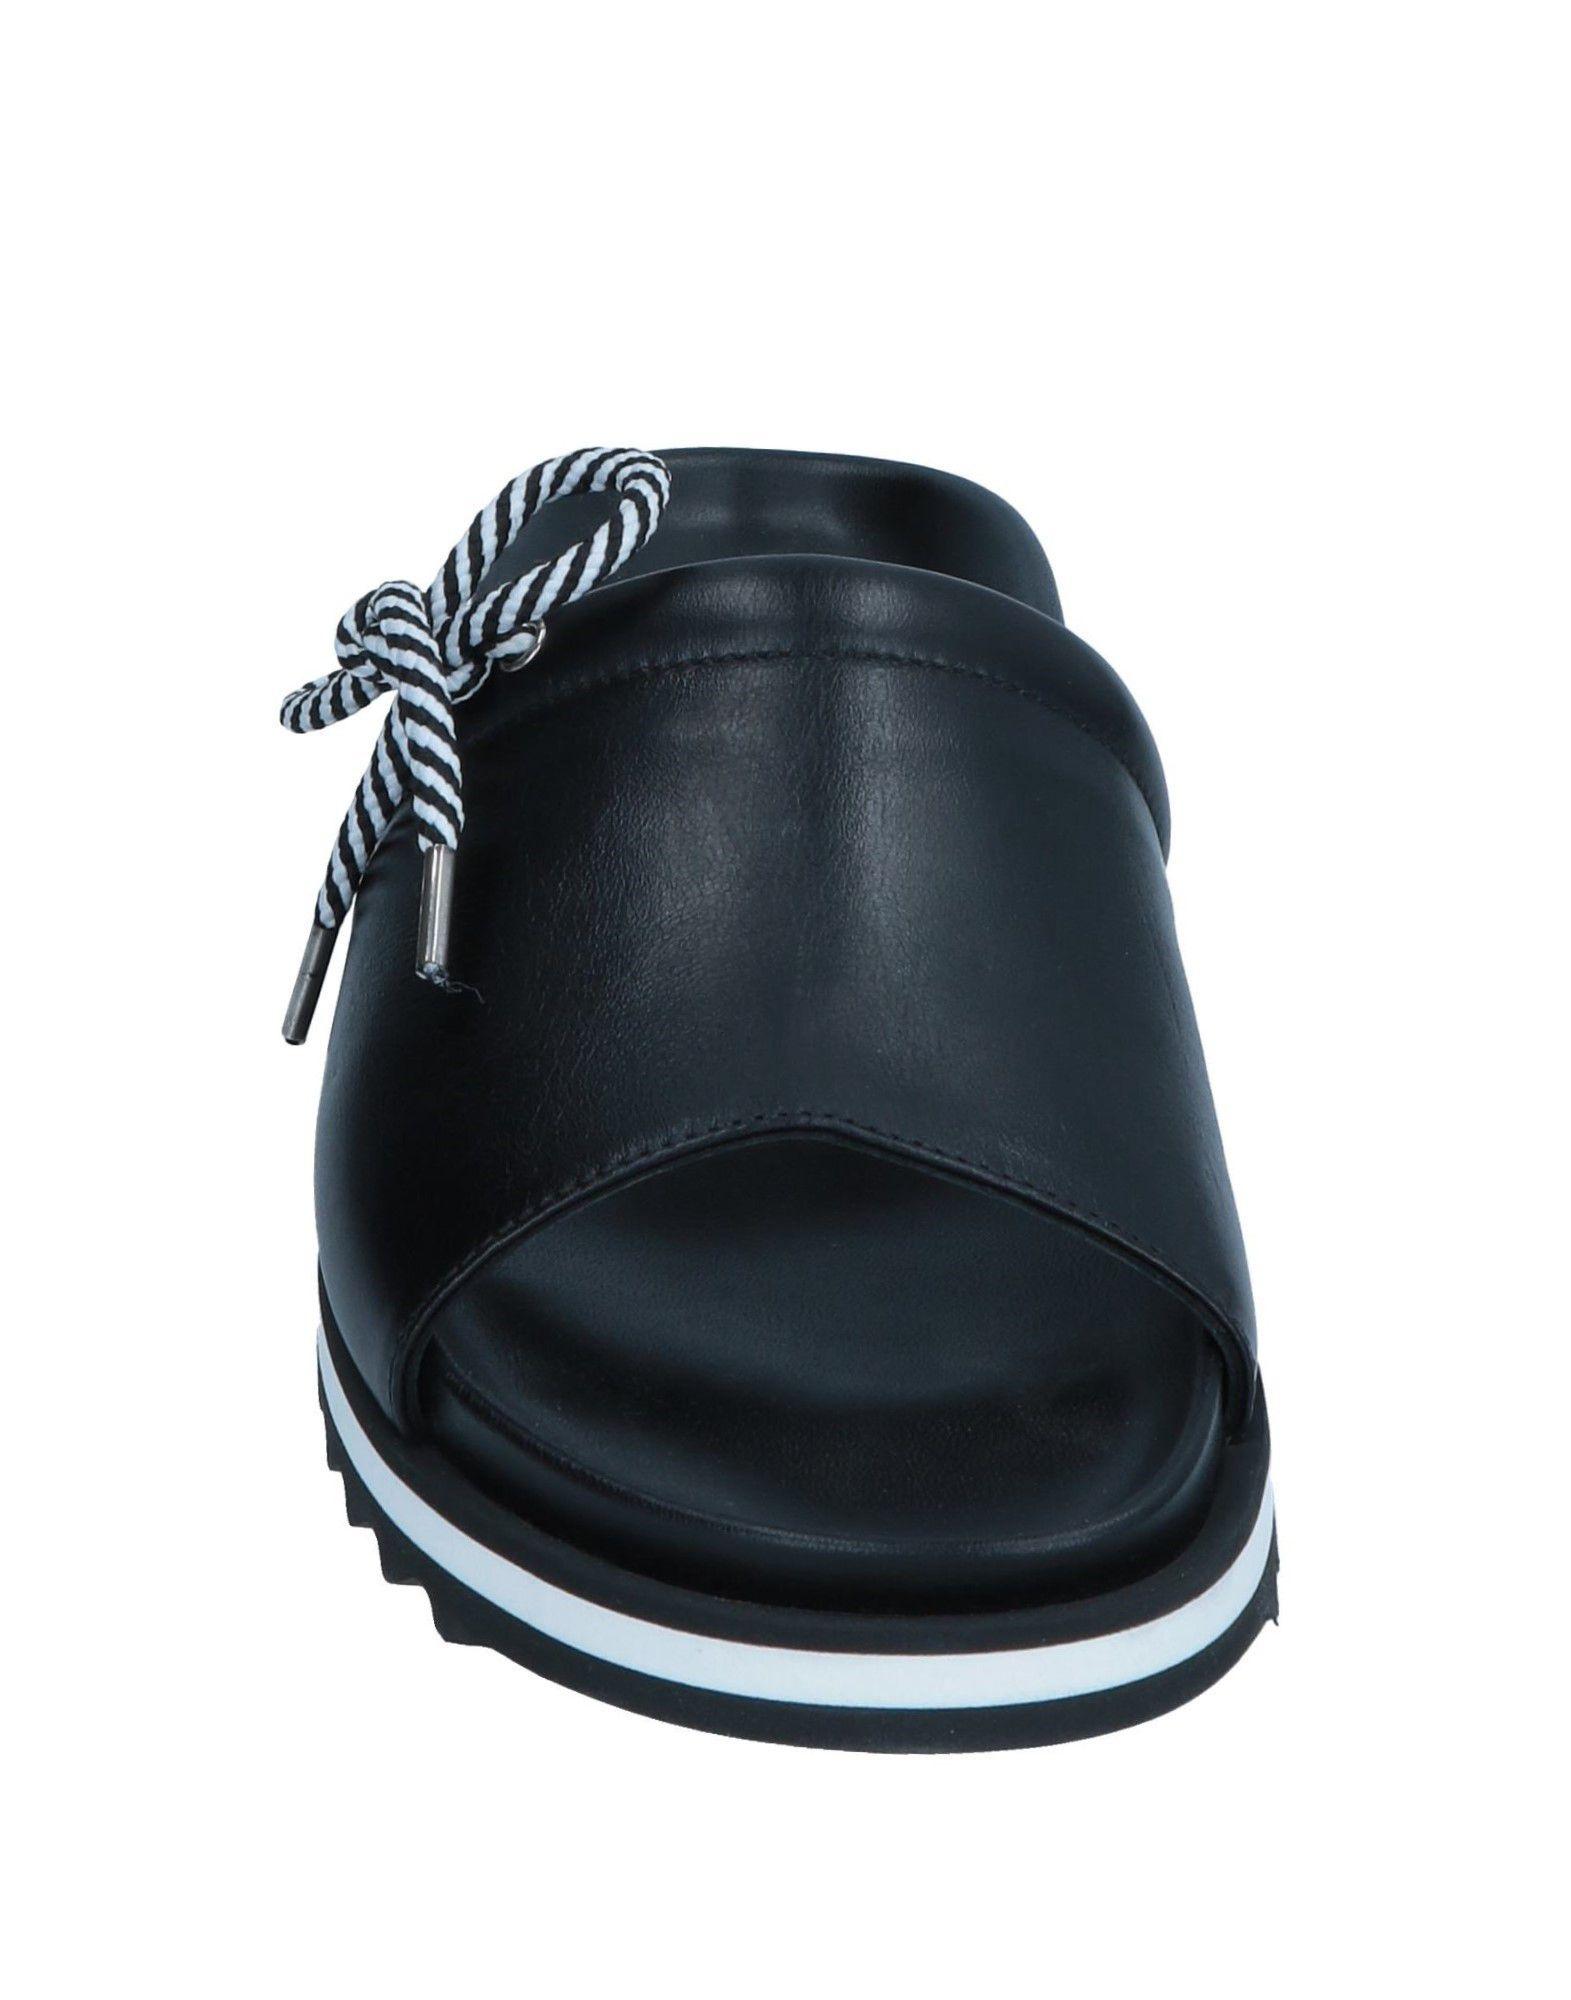 Stilvolle billige Damen Schuhe John Galliano Sandalen Damen billige  11545546NB 288ae8